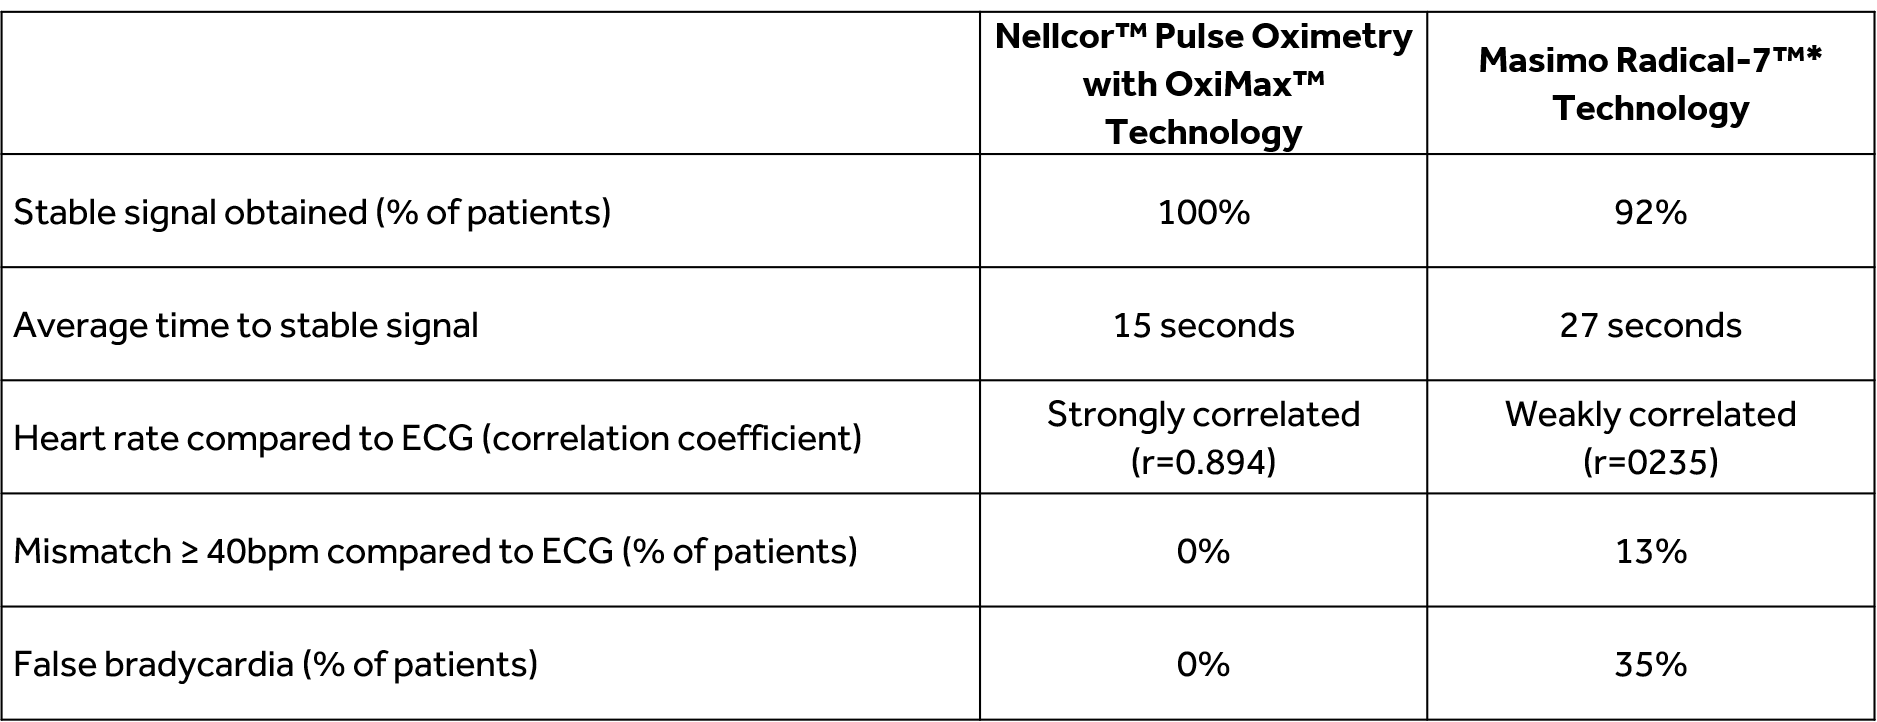 Comparison of Nellcor™ and Masimo Pulse Oximeters in Neonates During Transition Period – Study Results